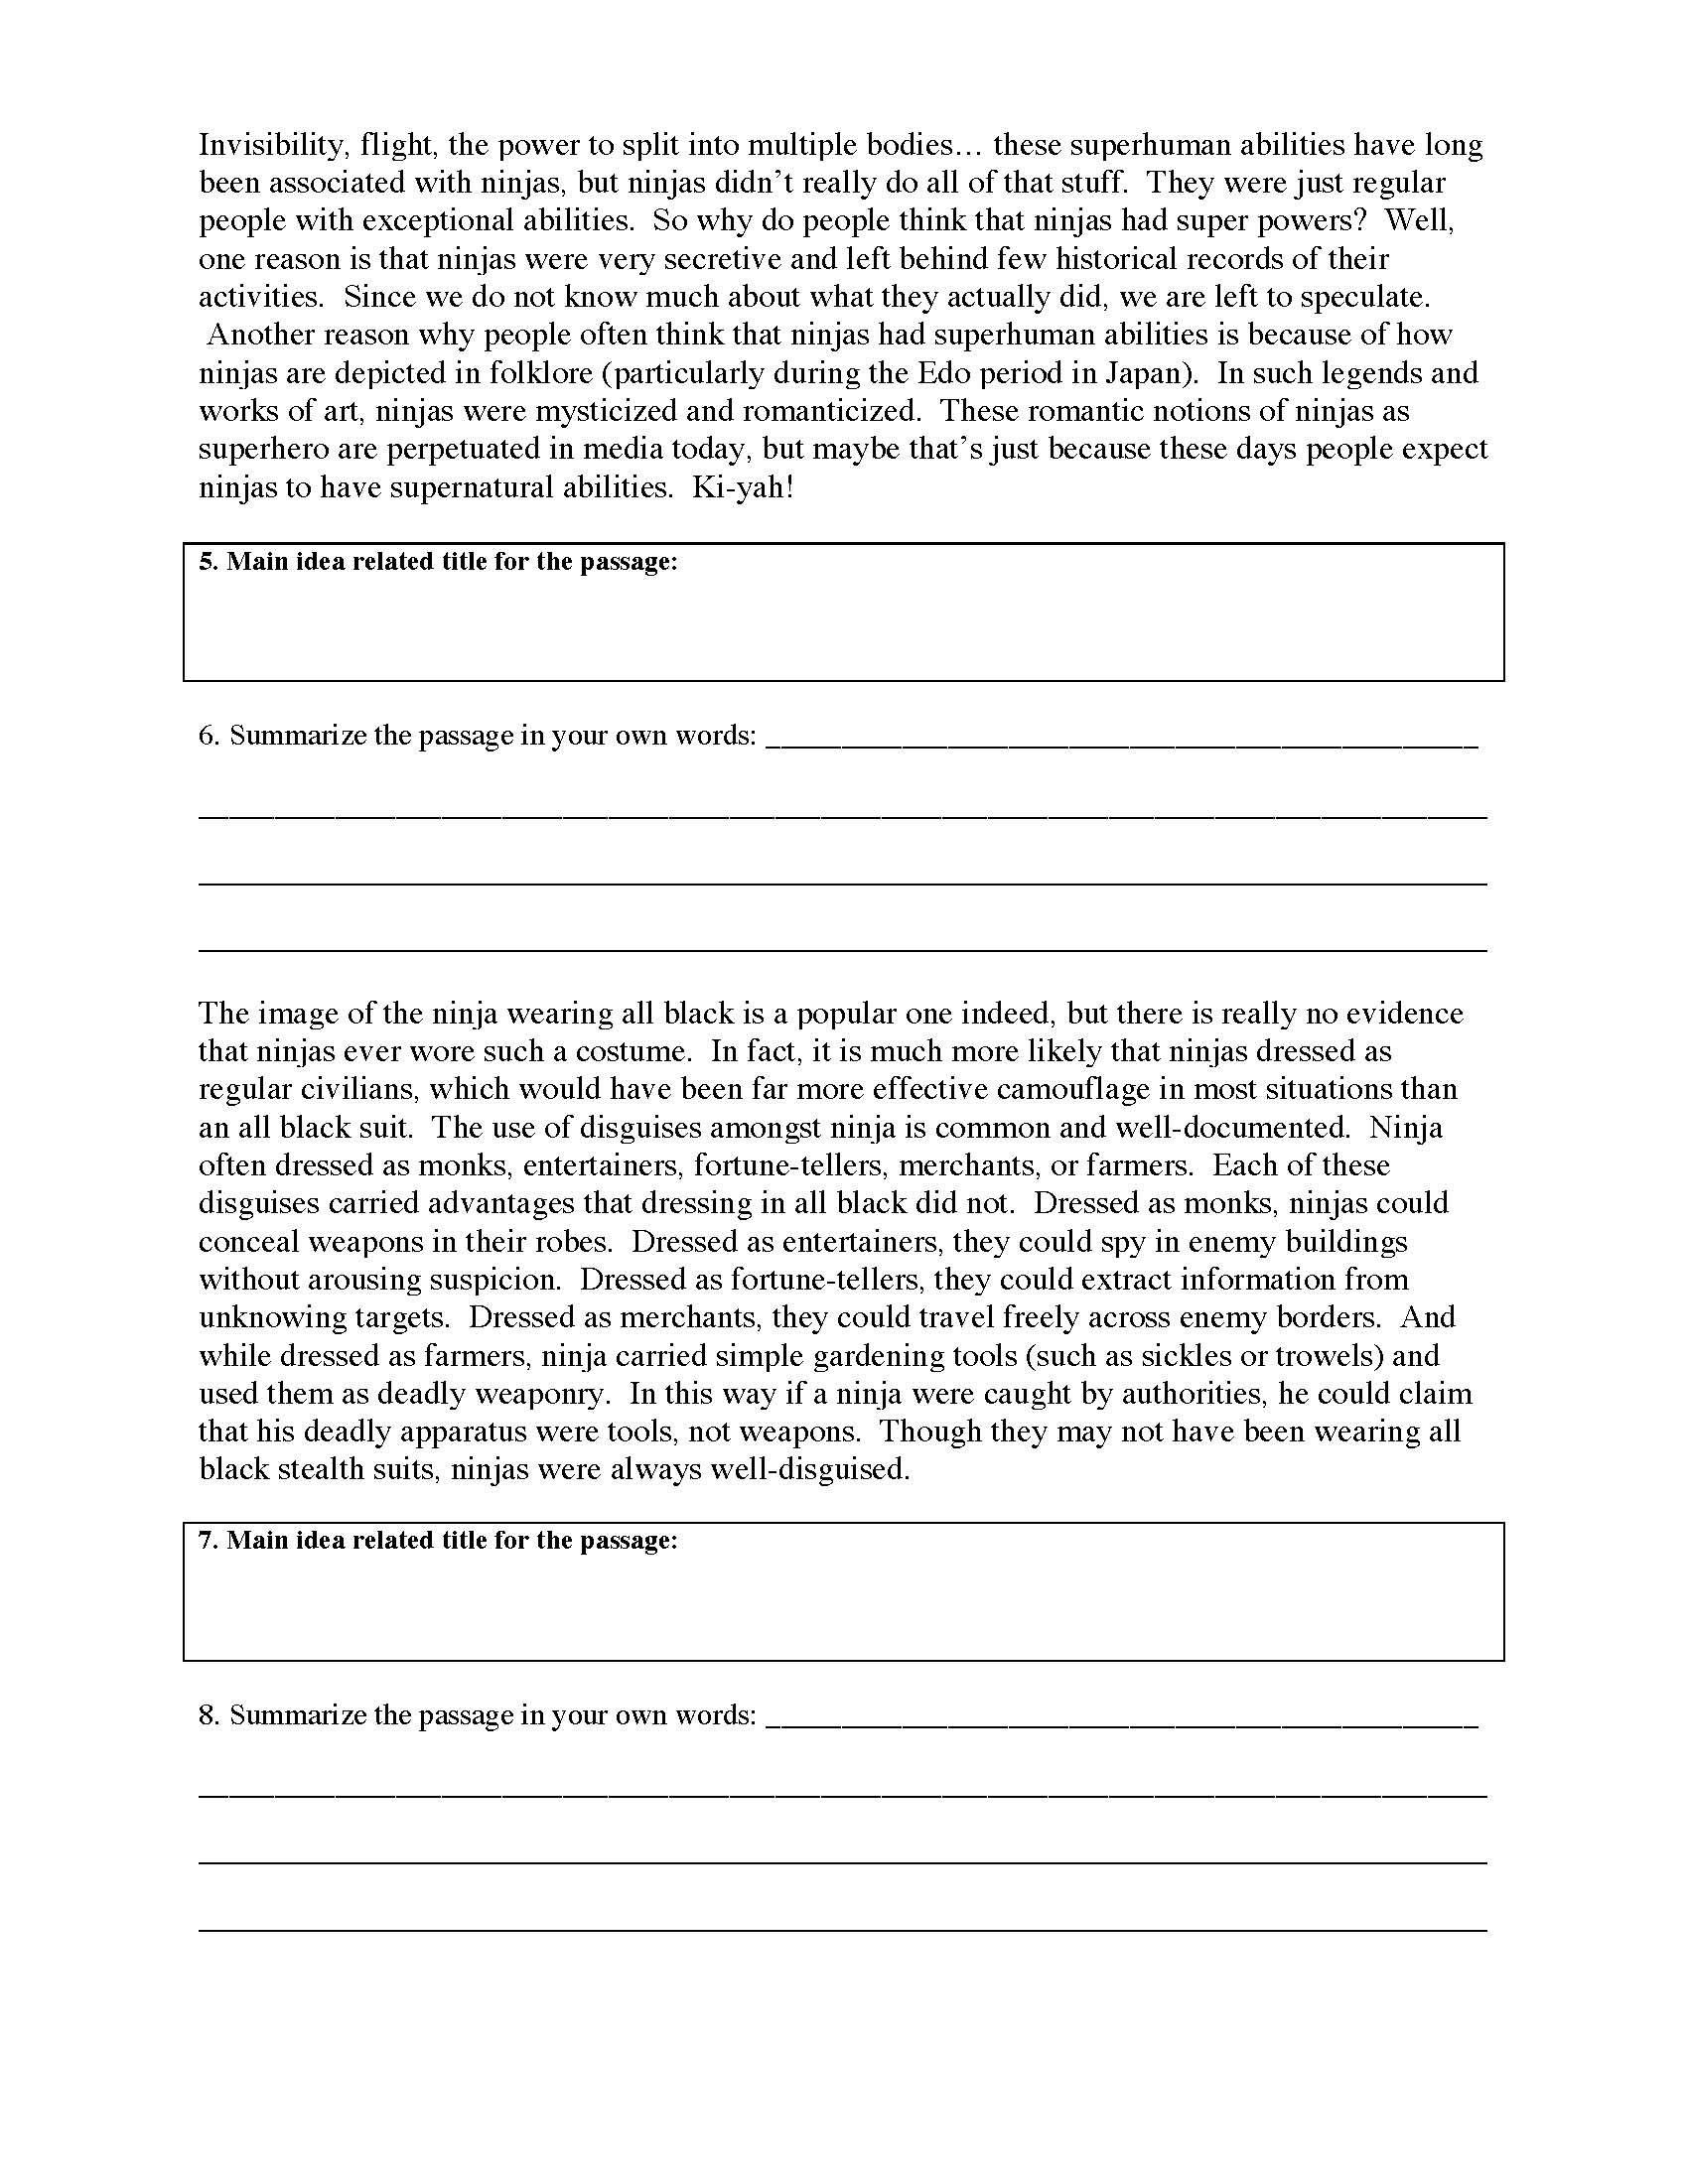 Summary And Main Idea Worksheet 2 Preview Summarizing Worksheet Reading Comprehension Worksheets Main Idea Worksheet [ 2200 x 1700 Pixel ]